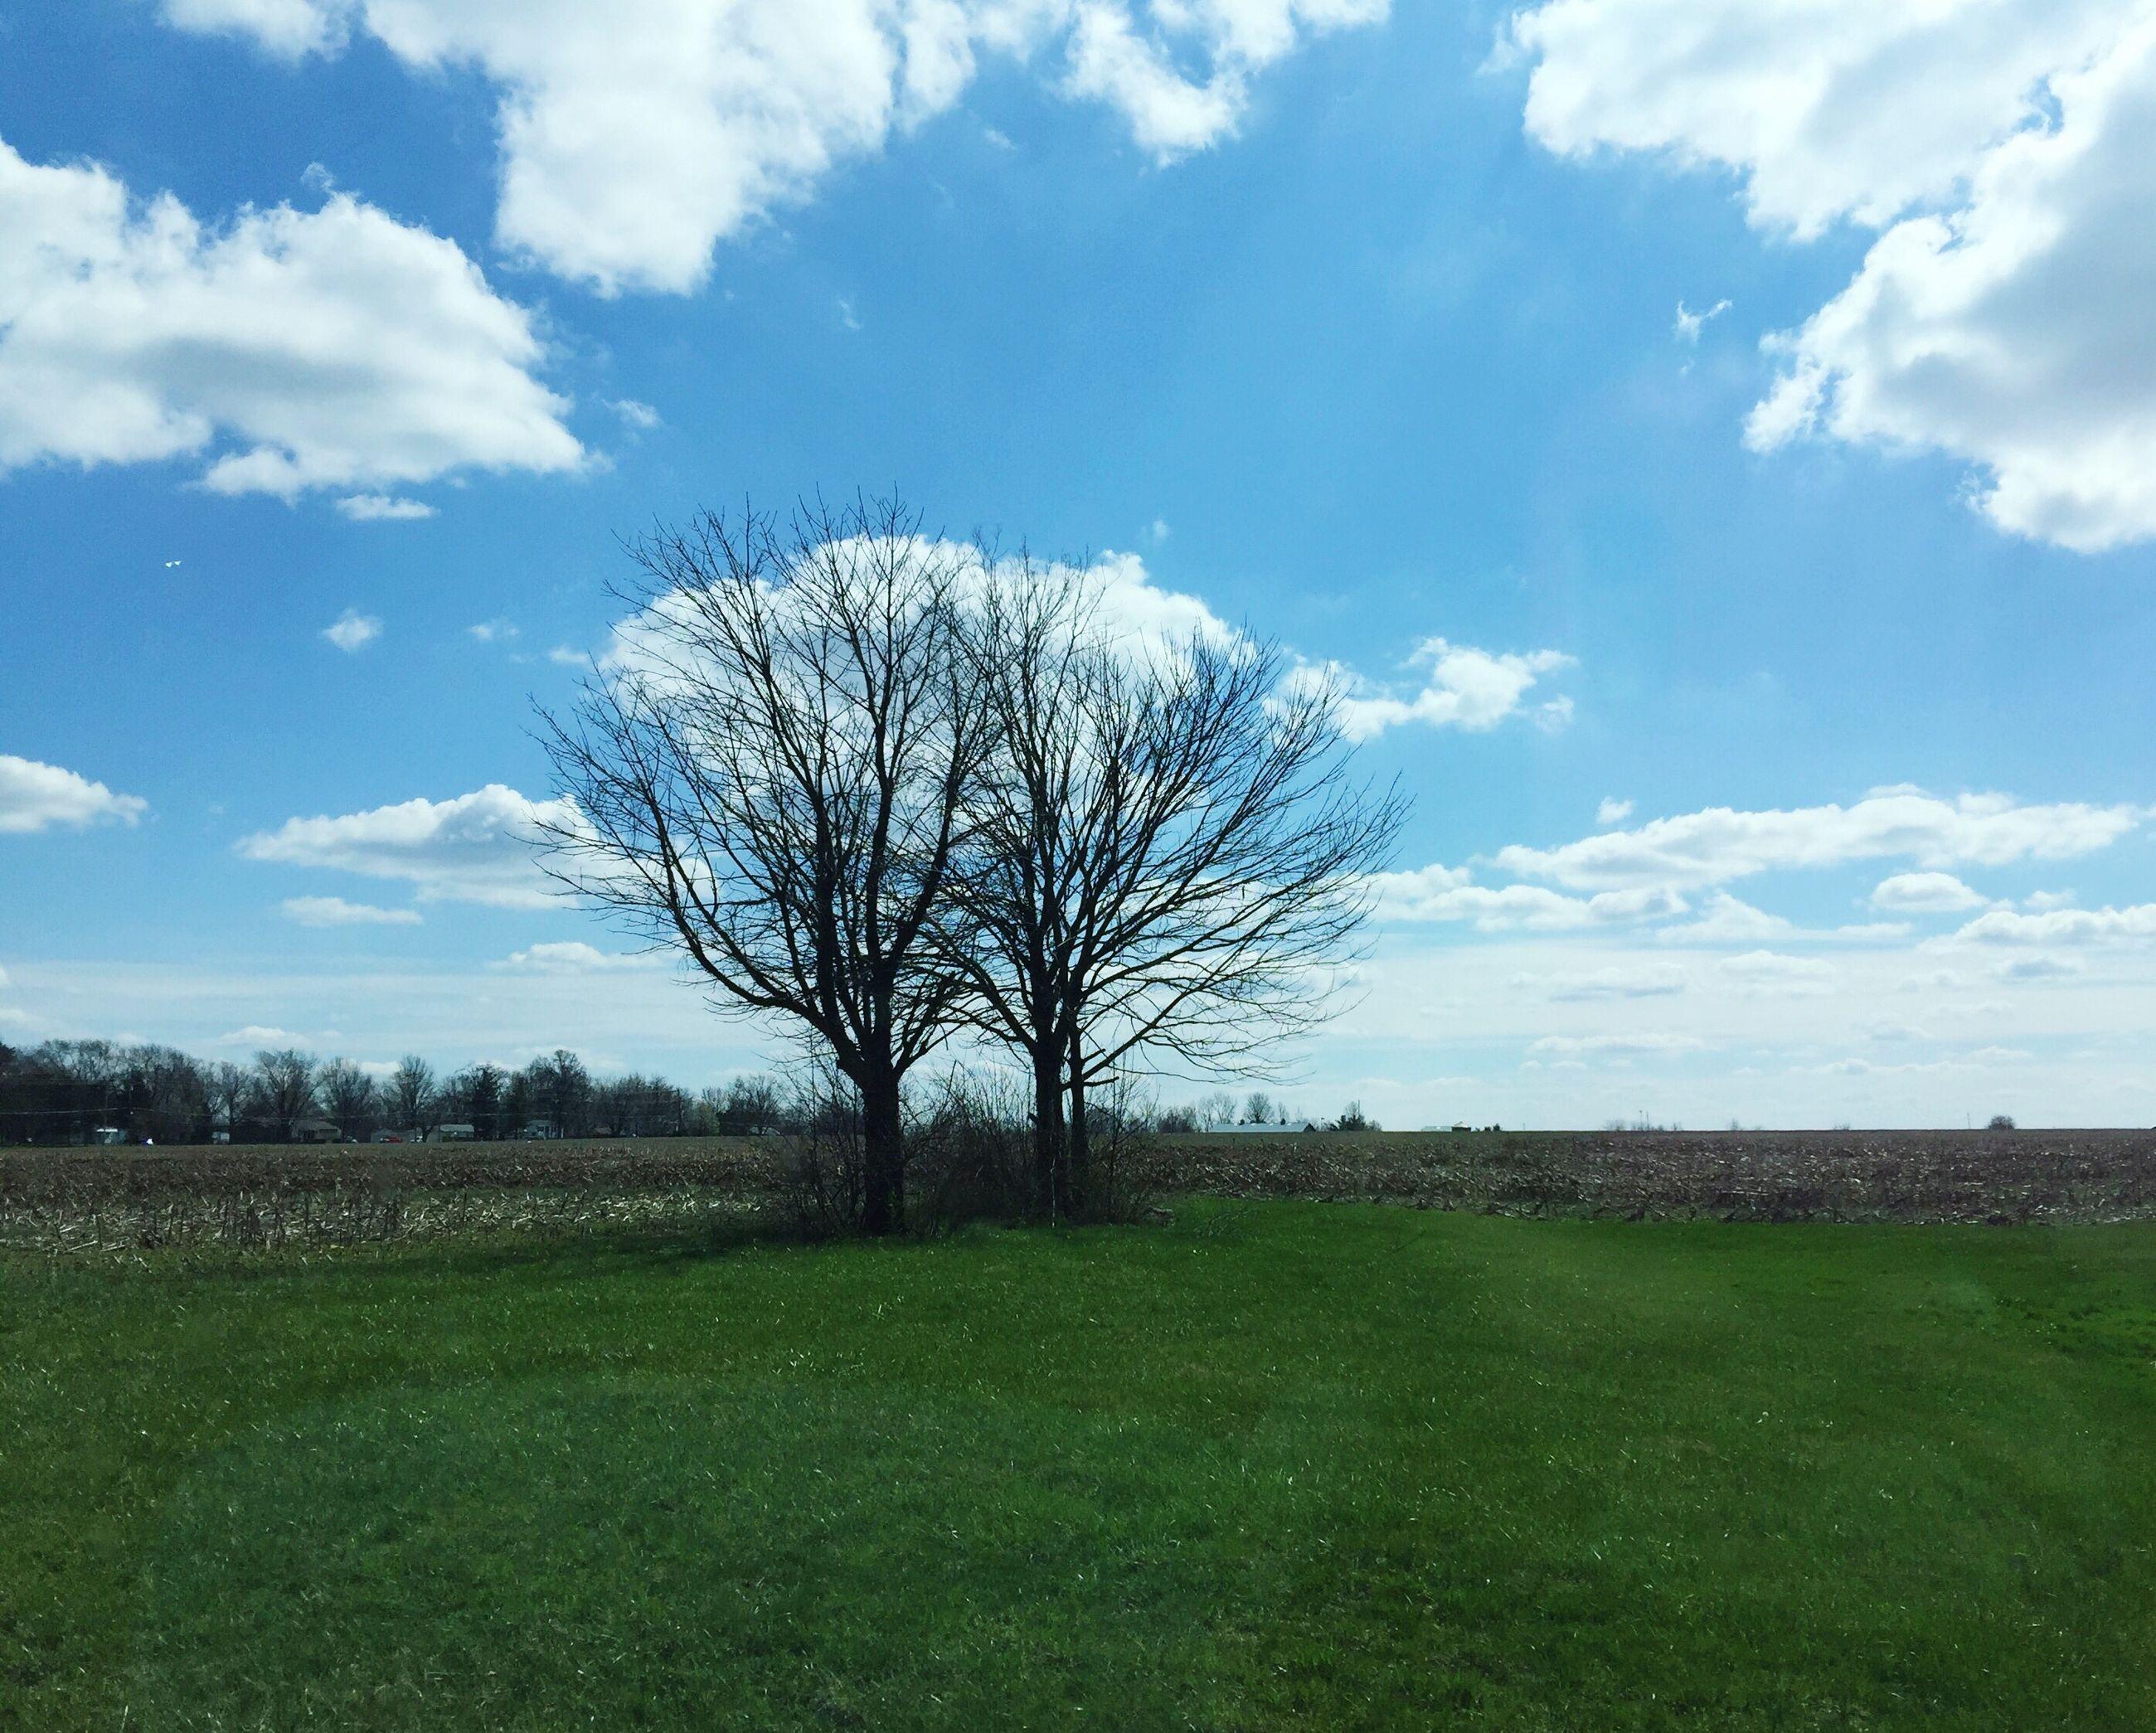 grass, tree, field, bare tree, tranquil scene, sky, landscape, tranquility, scenics, beauty in nature, nature, grassy, branch, cloud - sky, growth, cloud, single tree, rural scene, non-urban scene, solitude